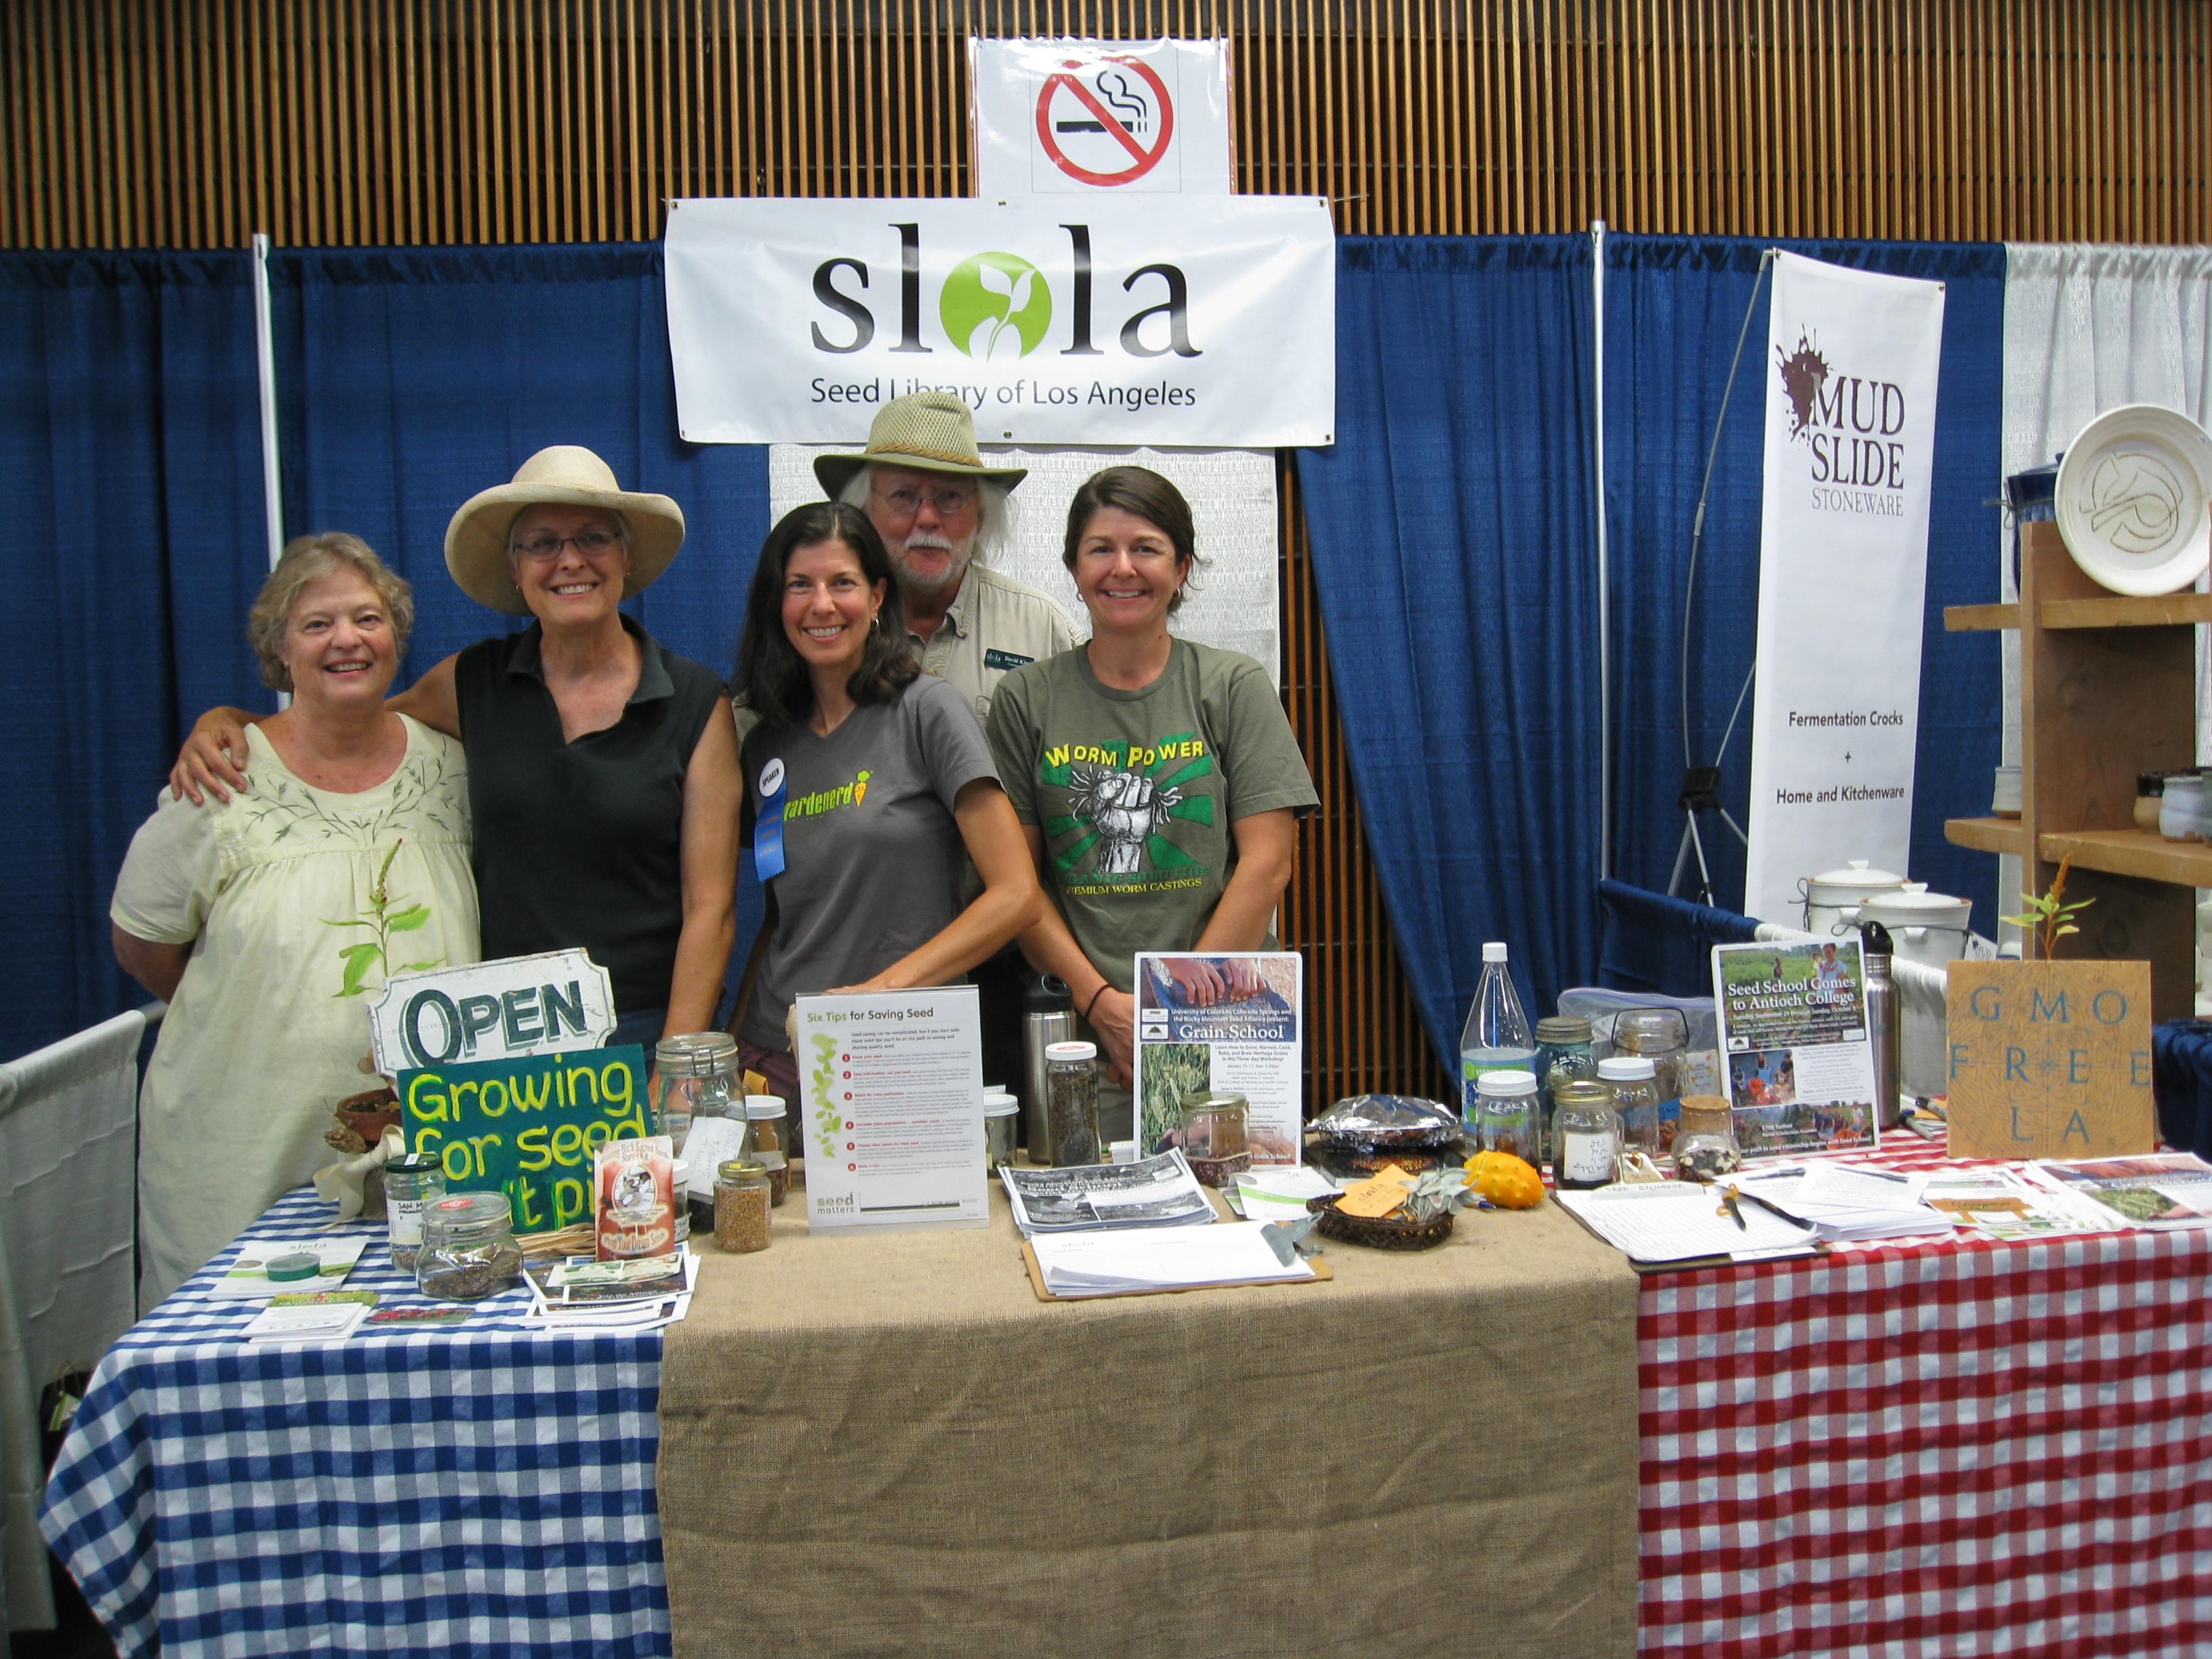 The LA Contingent: Yvonne Savio, Dana Morgan, Me, David King and Laura Maher of the Camarillo Seed Library.